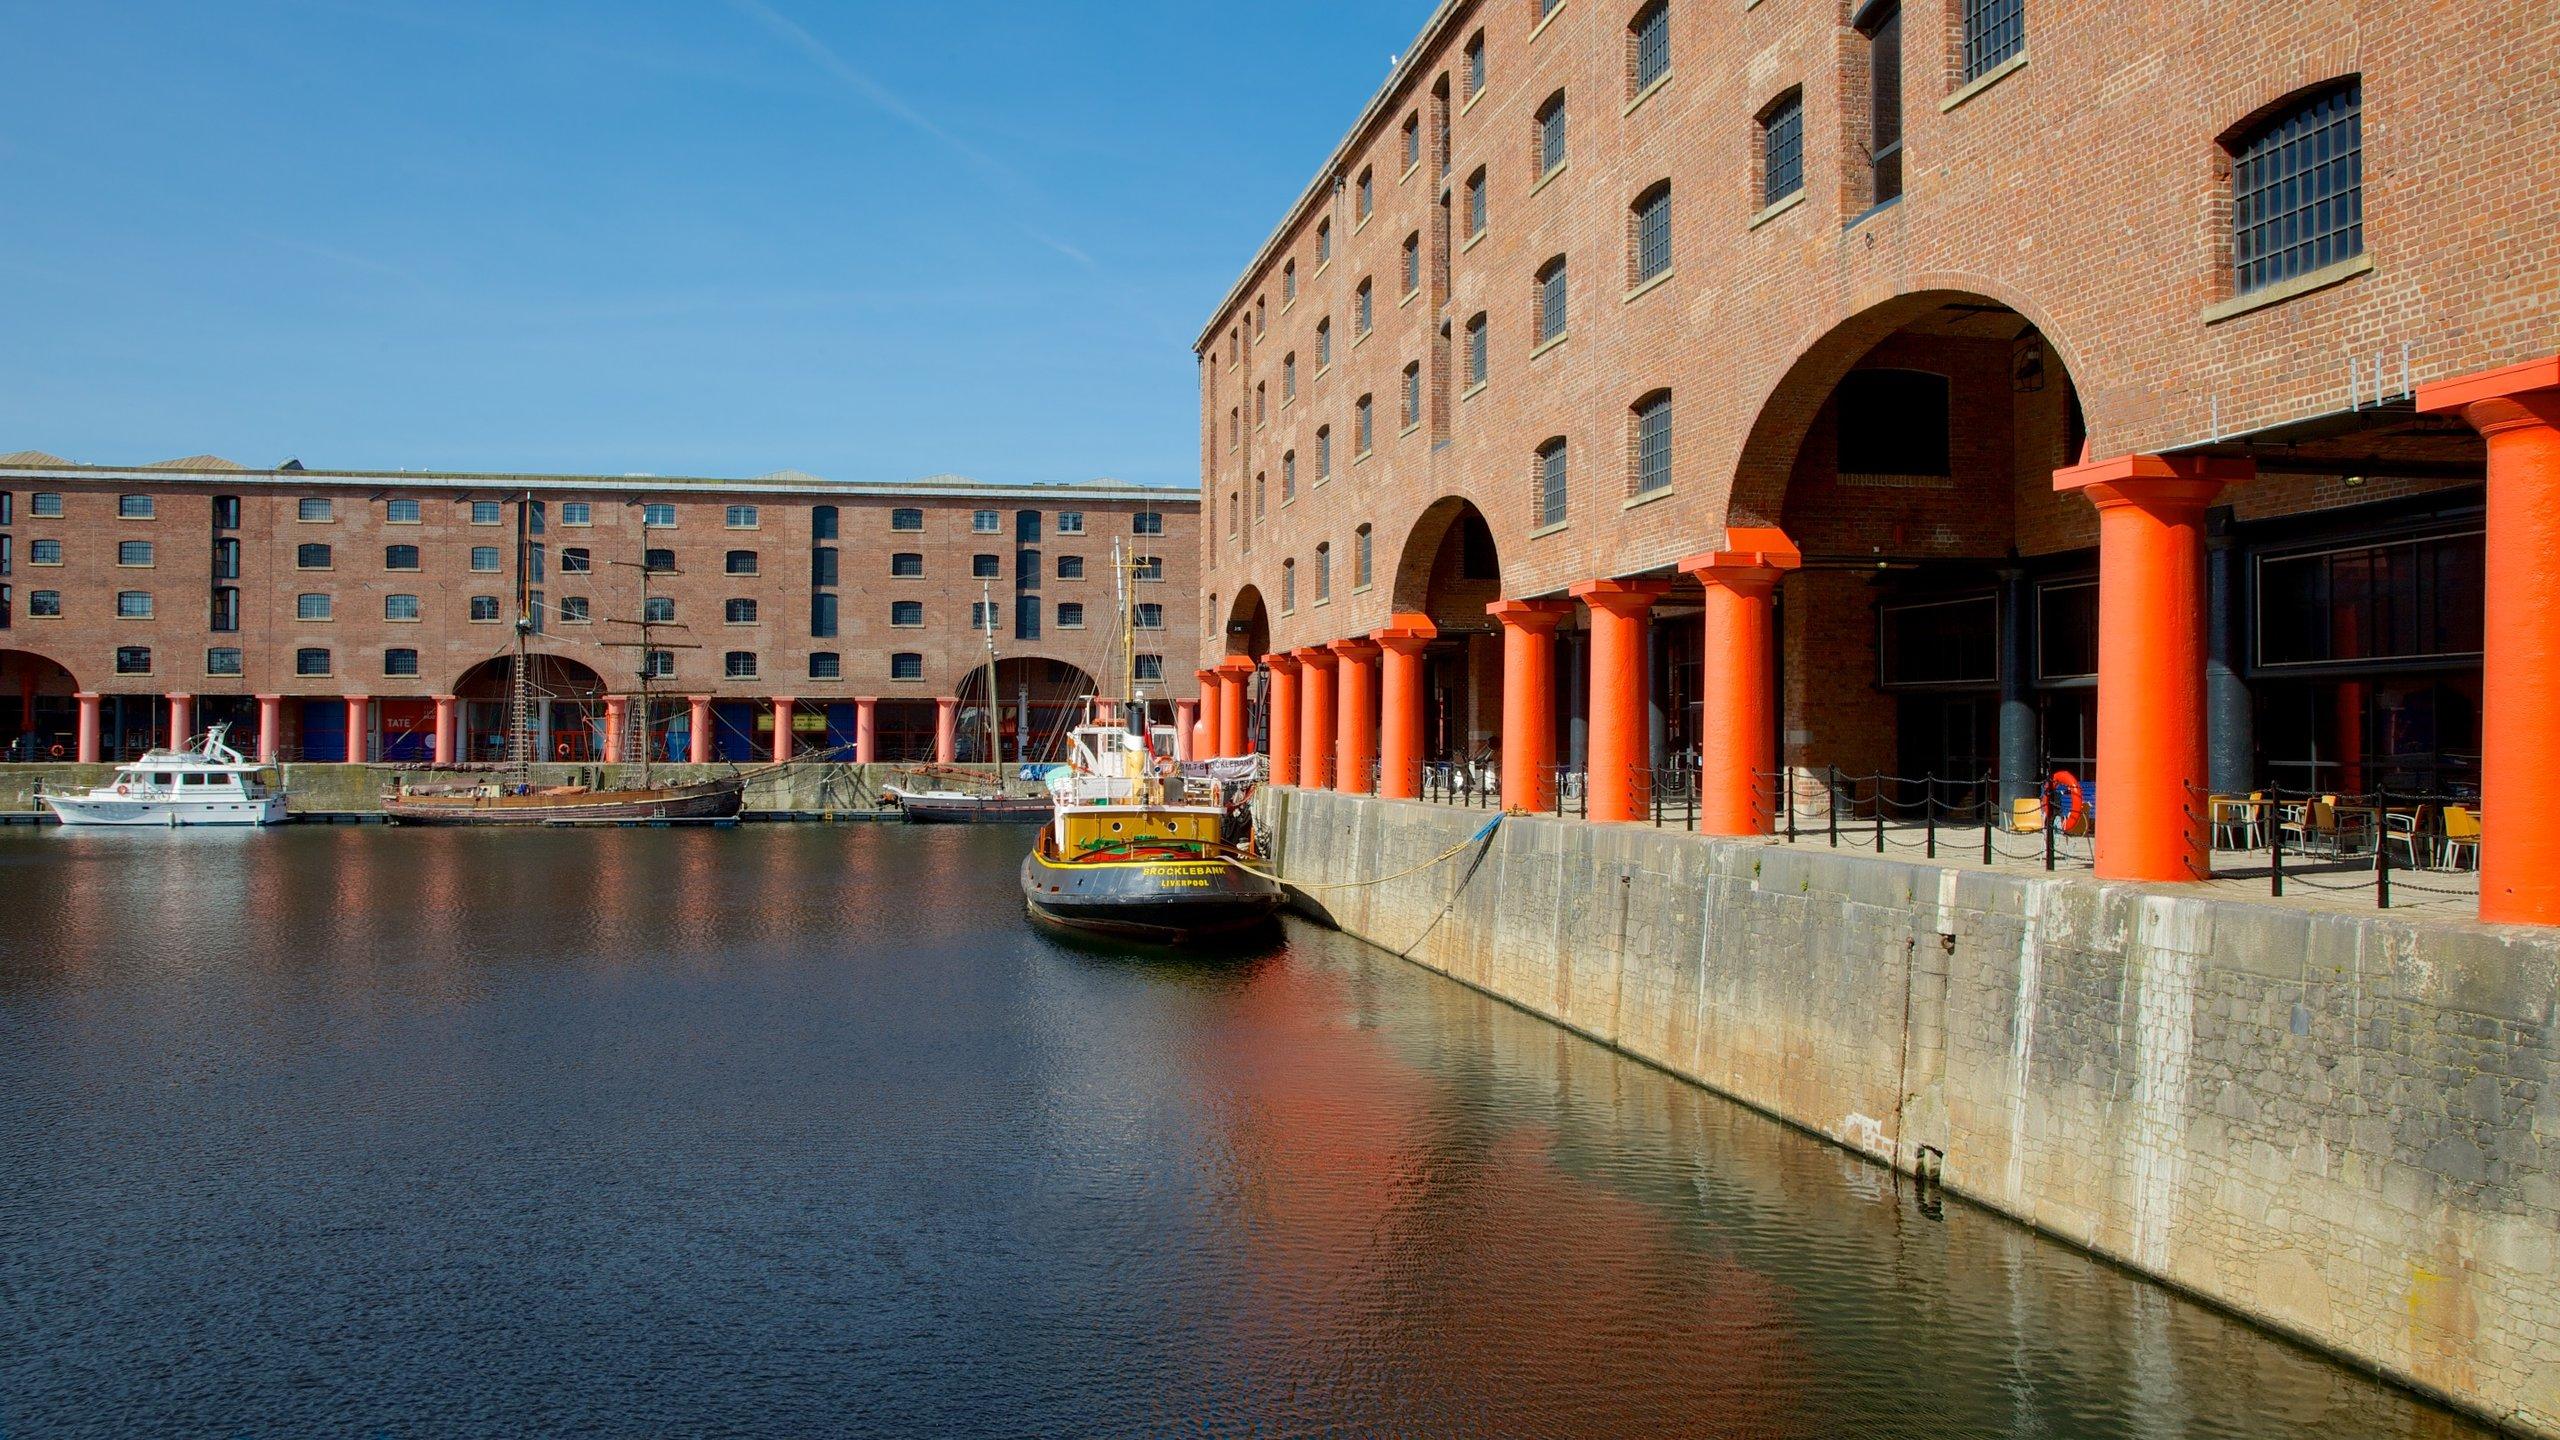 Albert Dock, Liverpool, England, United Kingdom